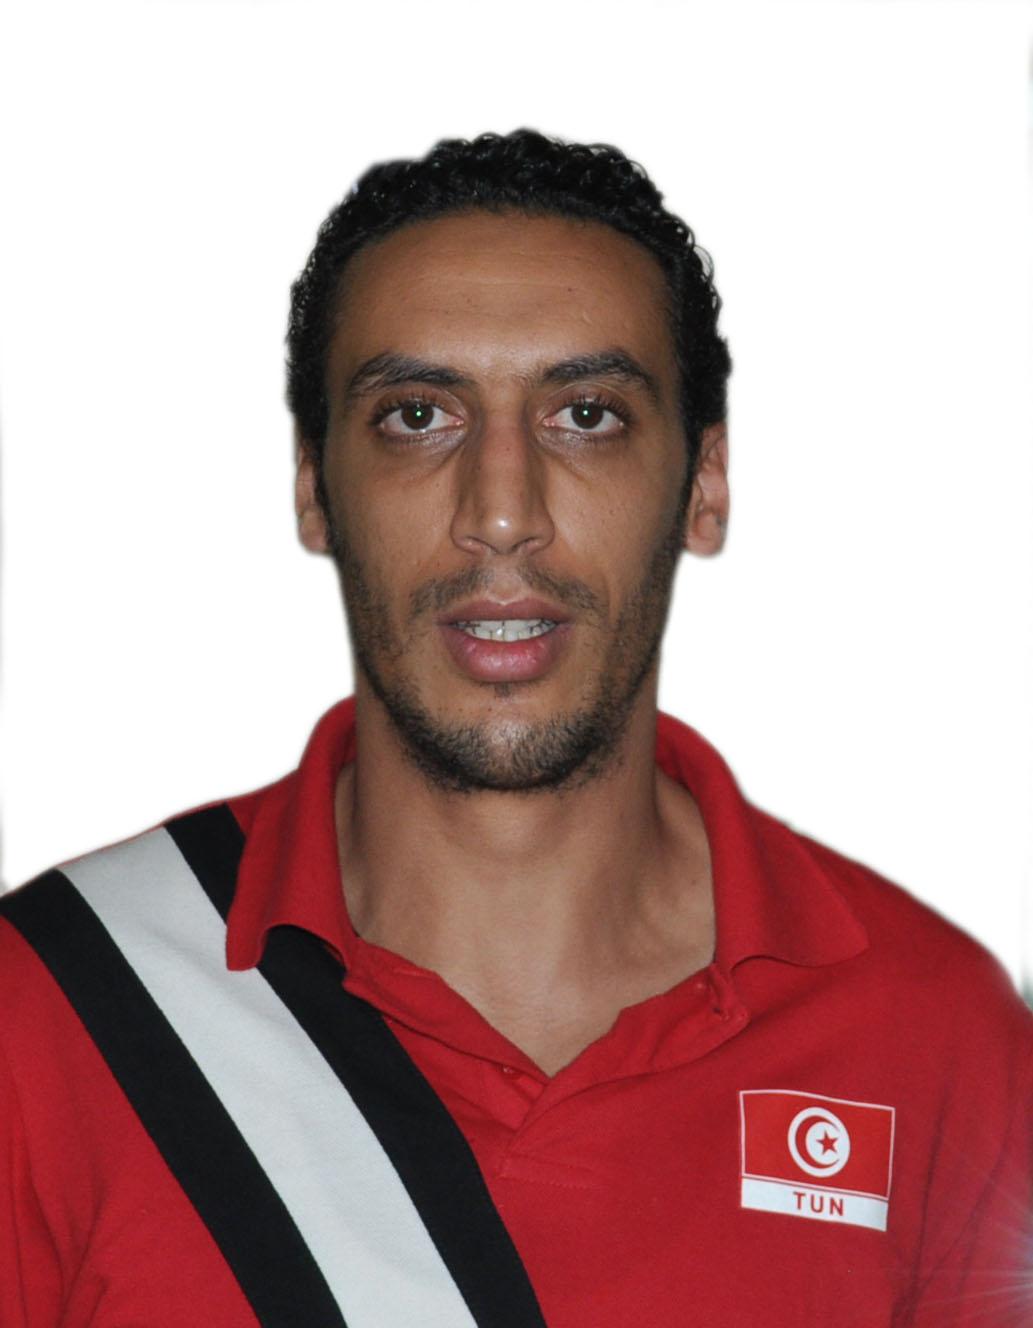 Hichem Kaabi